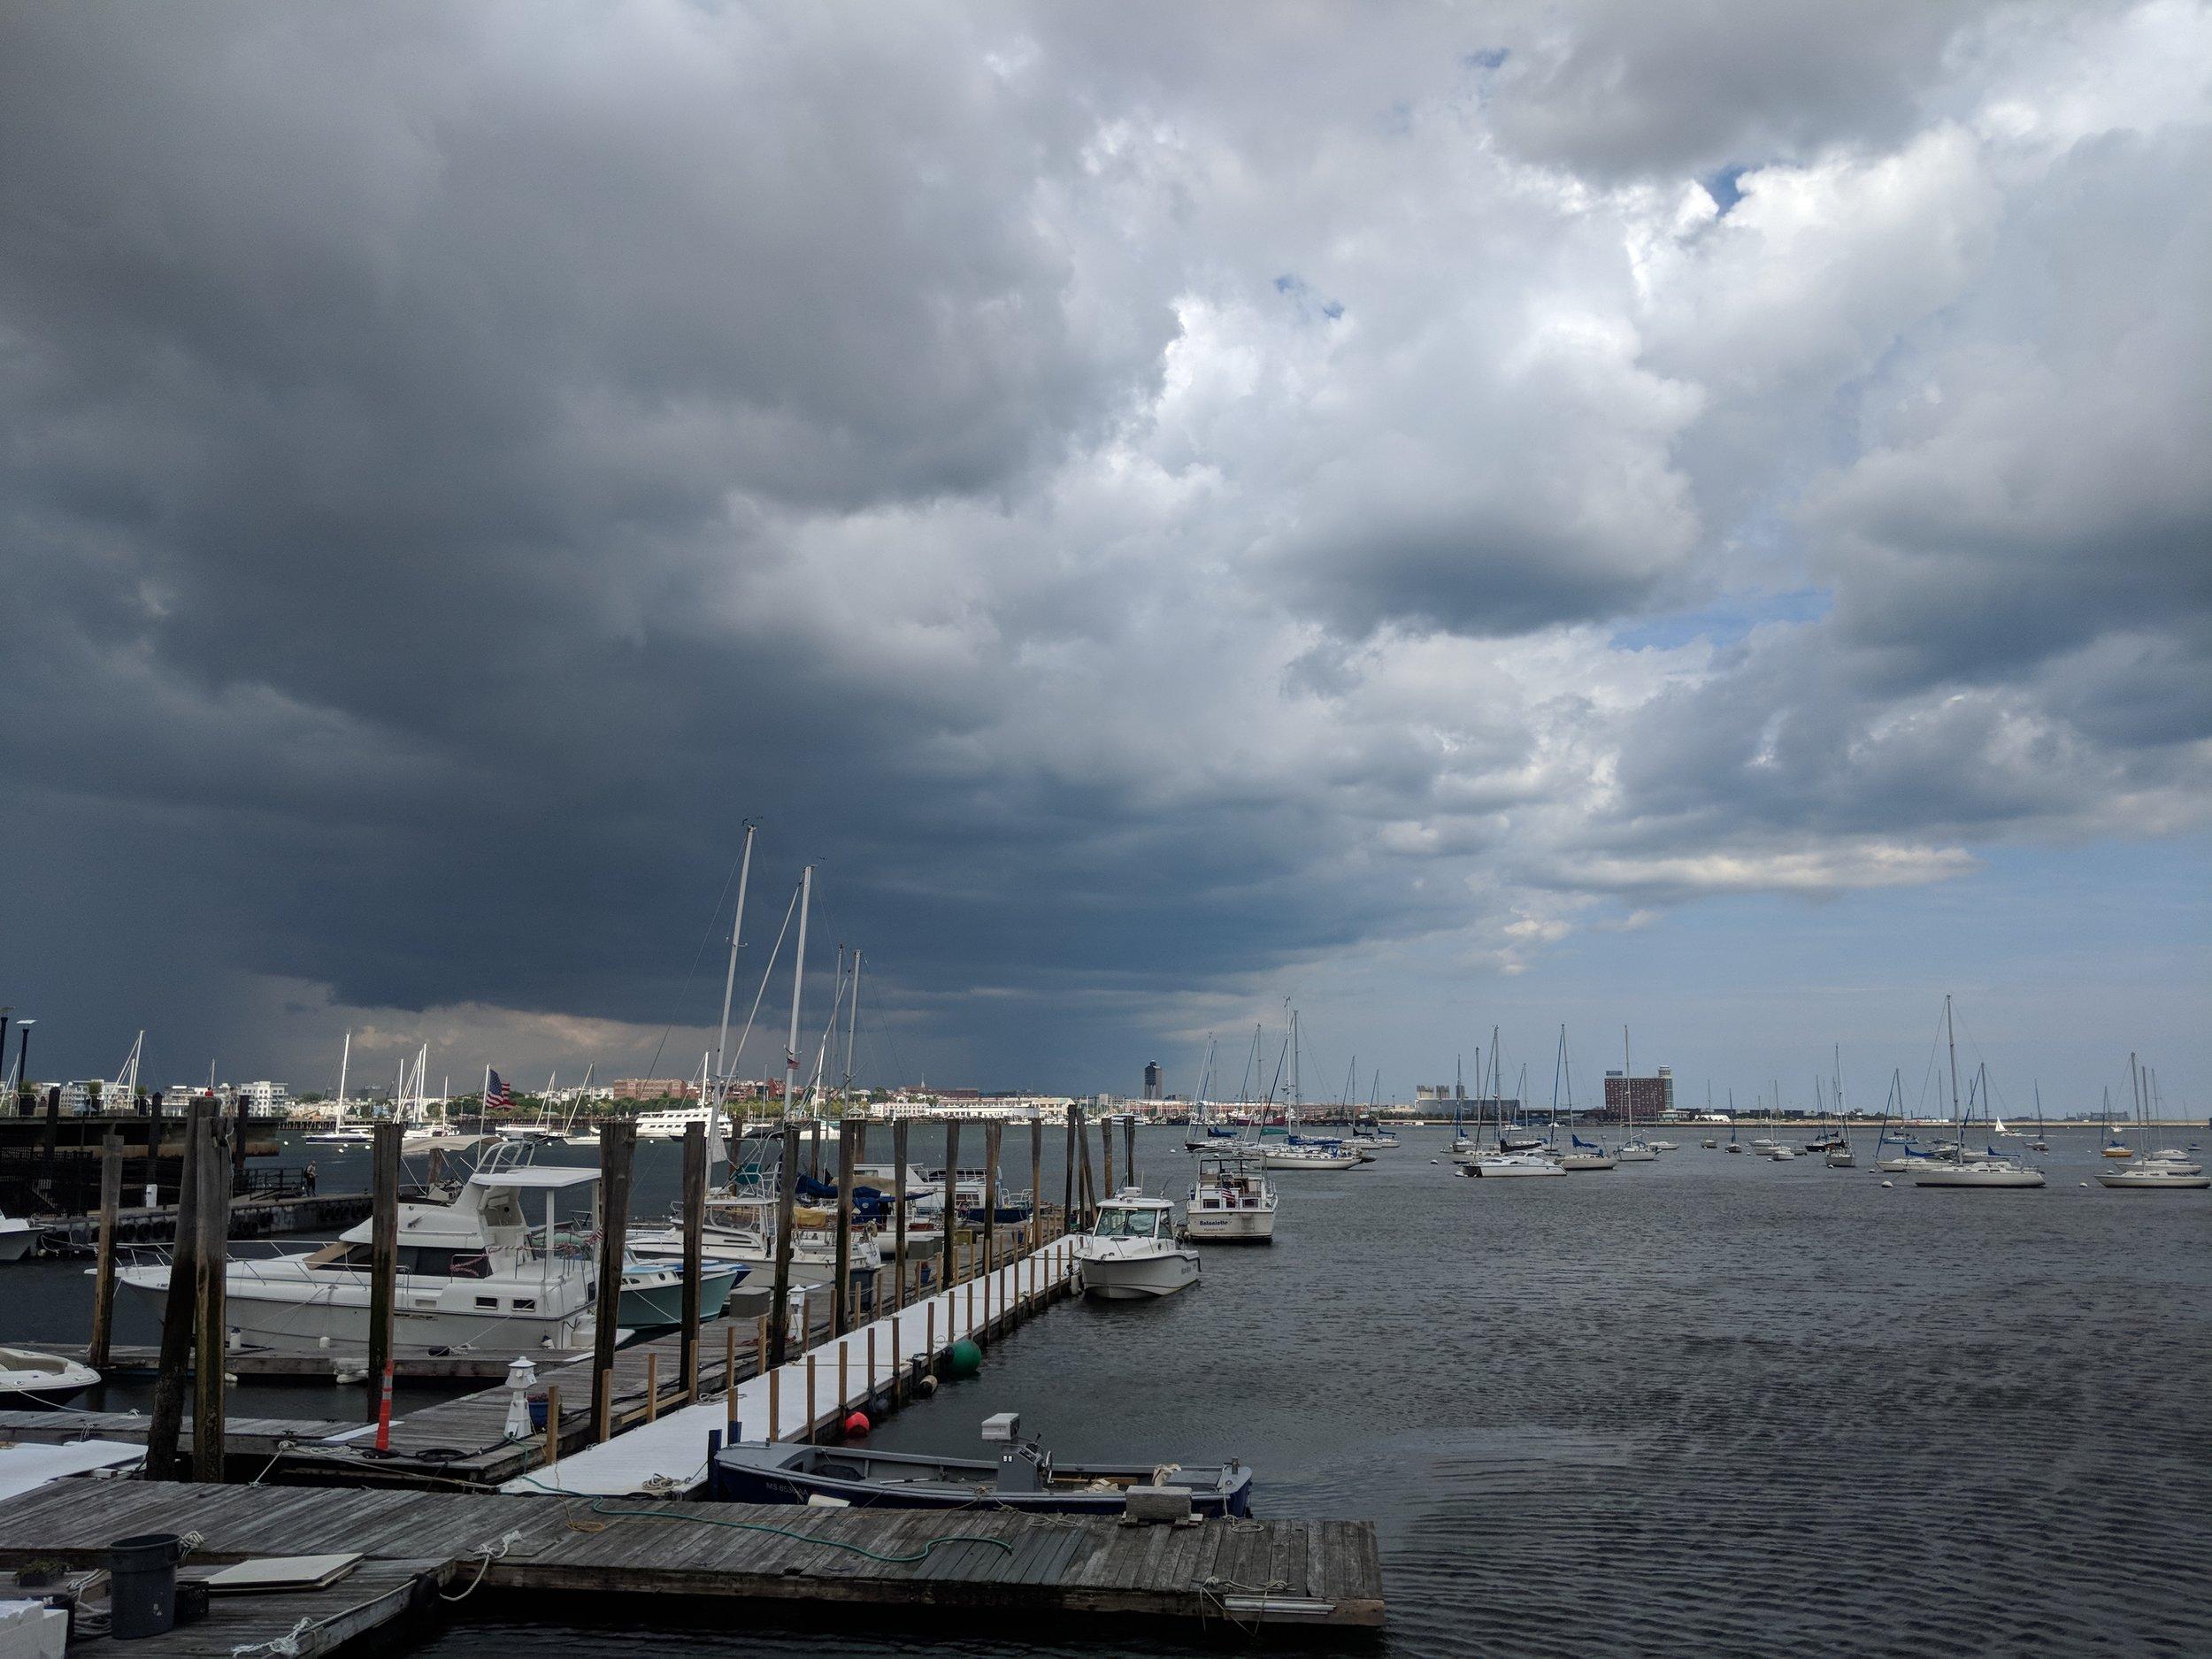 bri rinehart; photography; weather